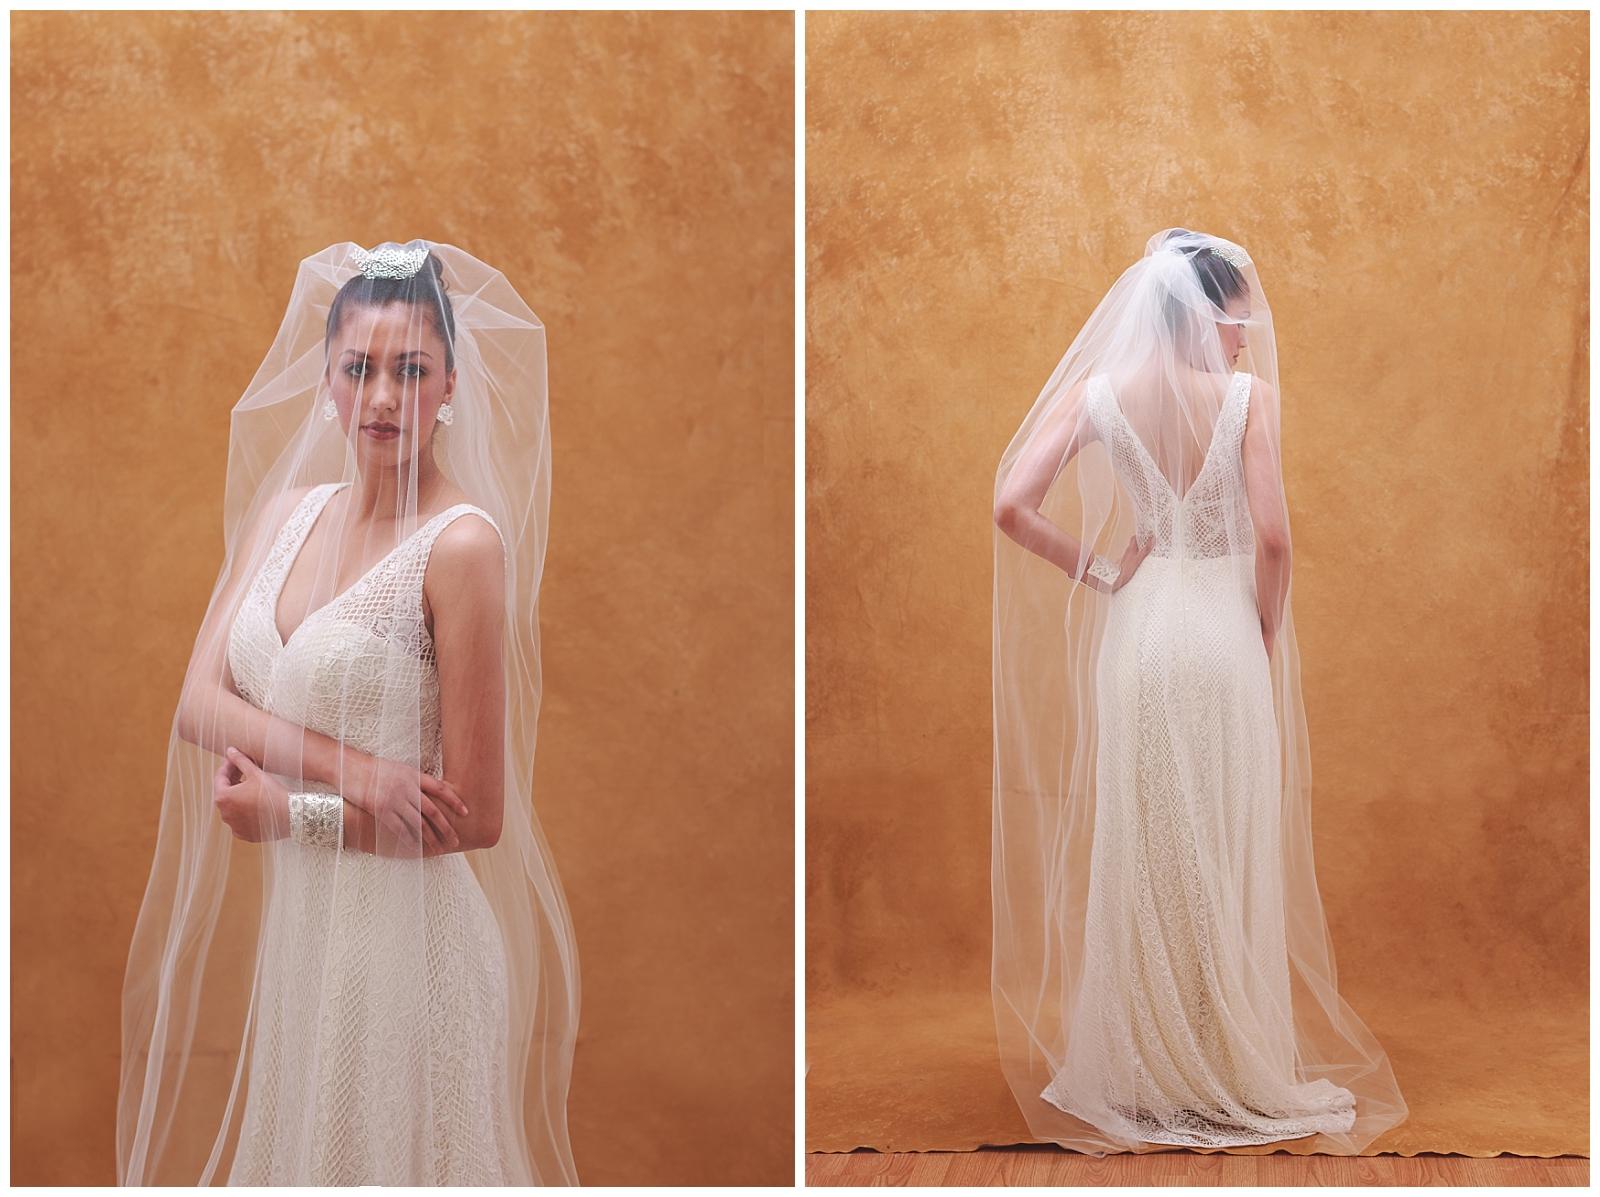 Bridal-Portraits-Veil-Inspiration-Epiphany-Gown-AGS-Photo-Art.jpg